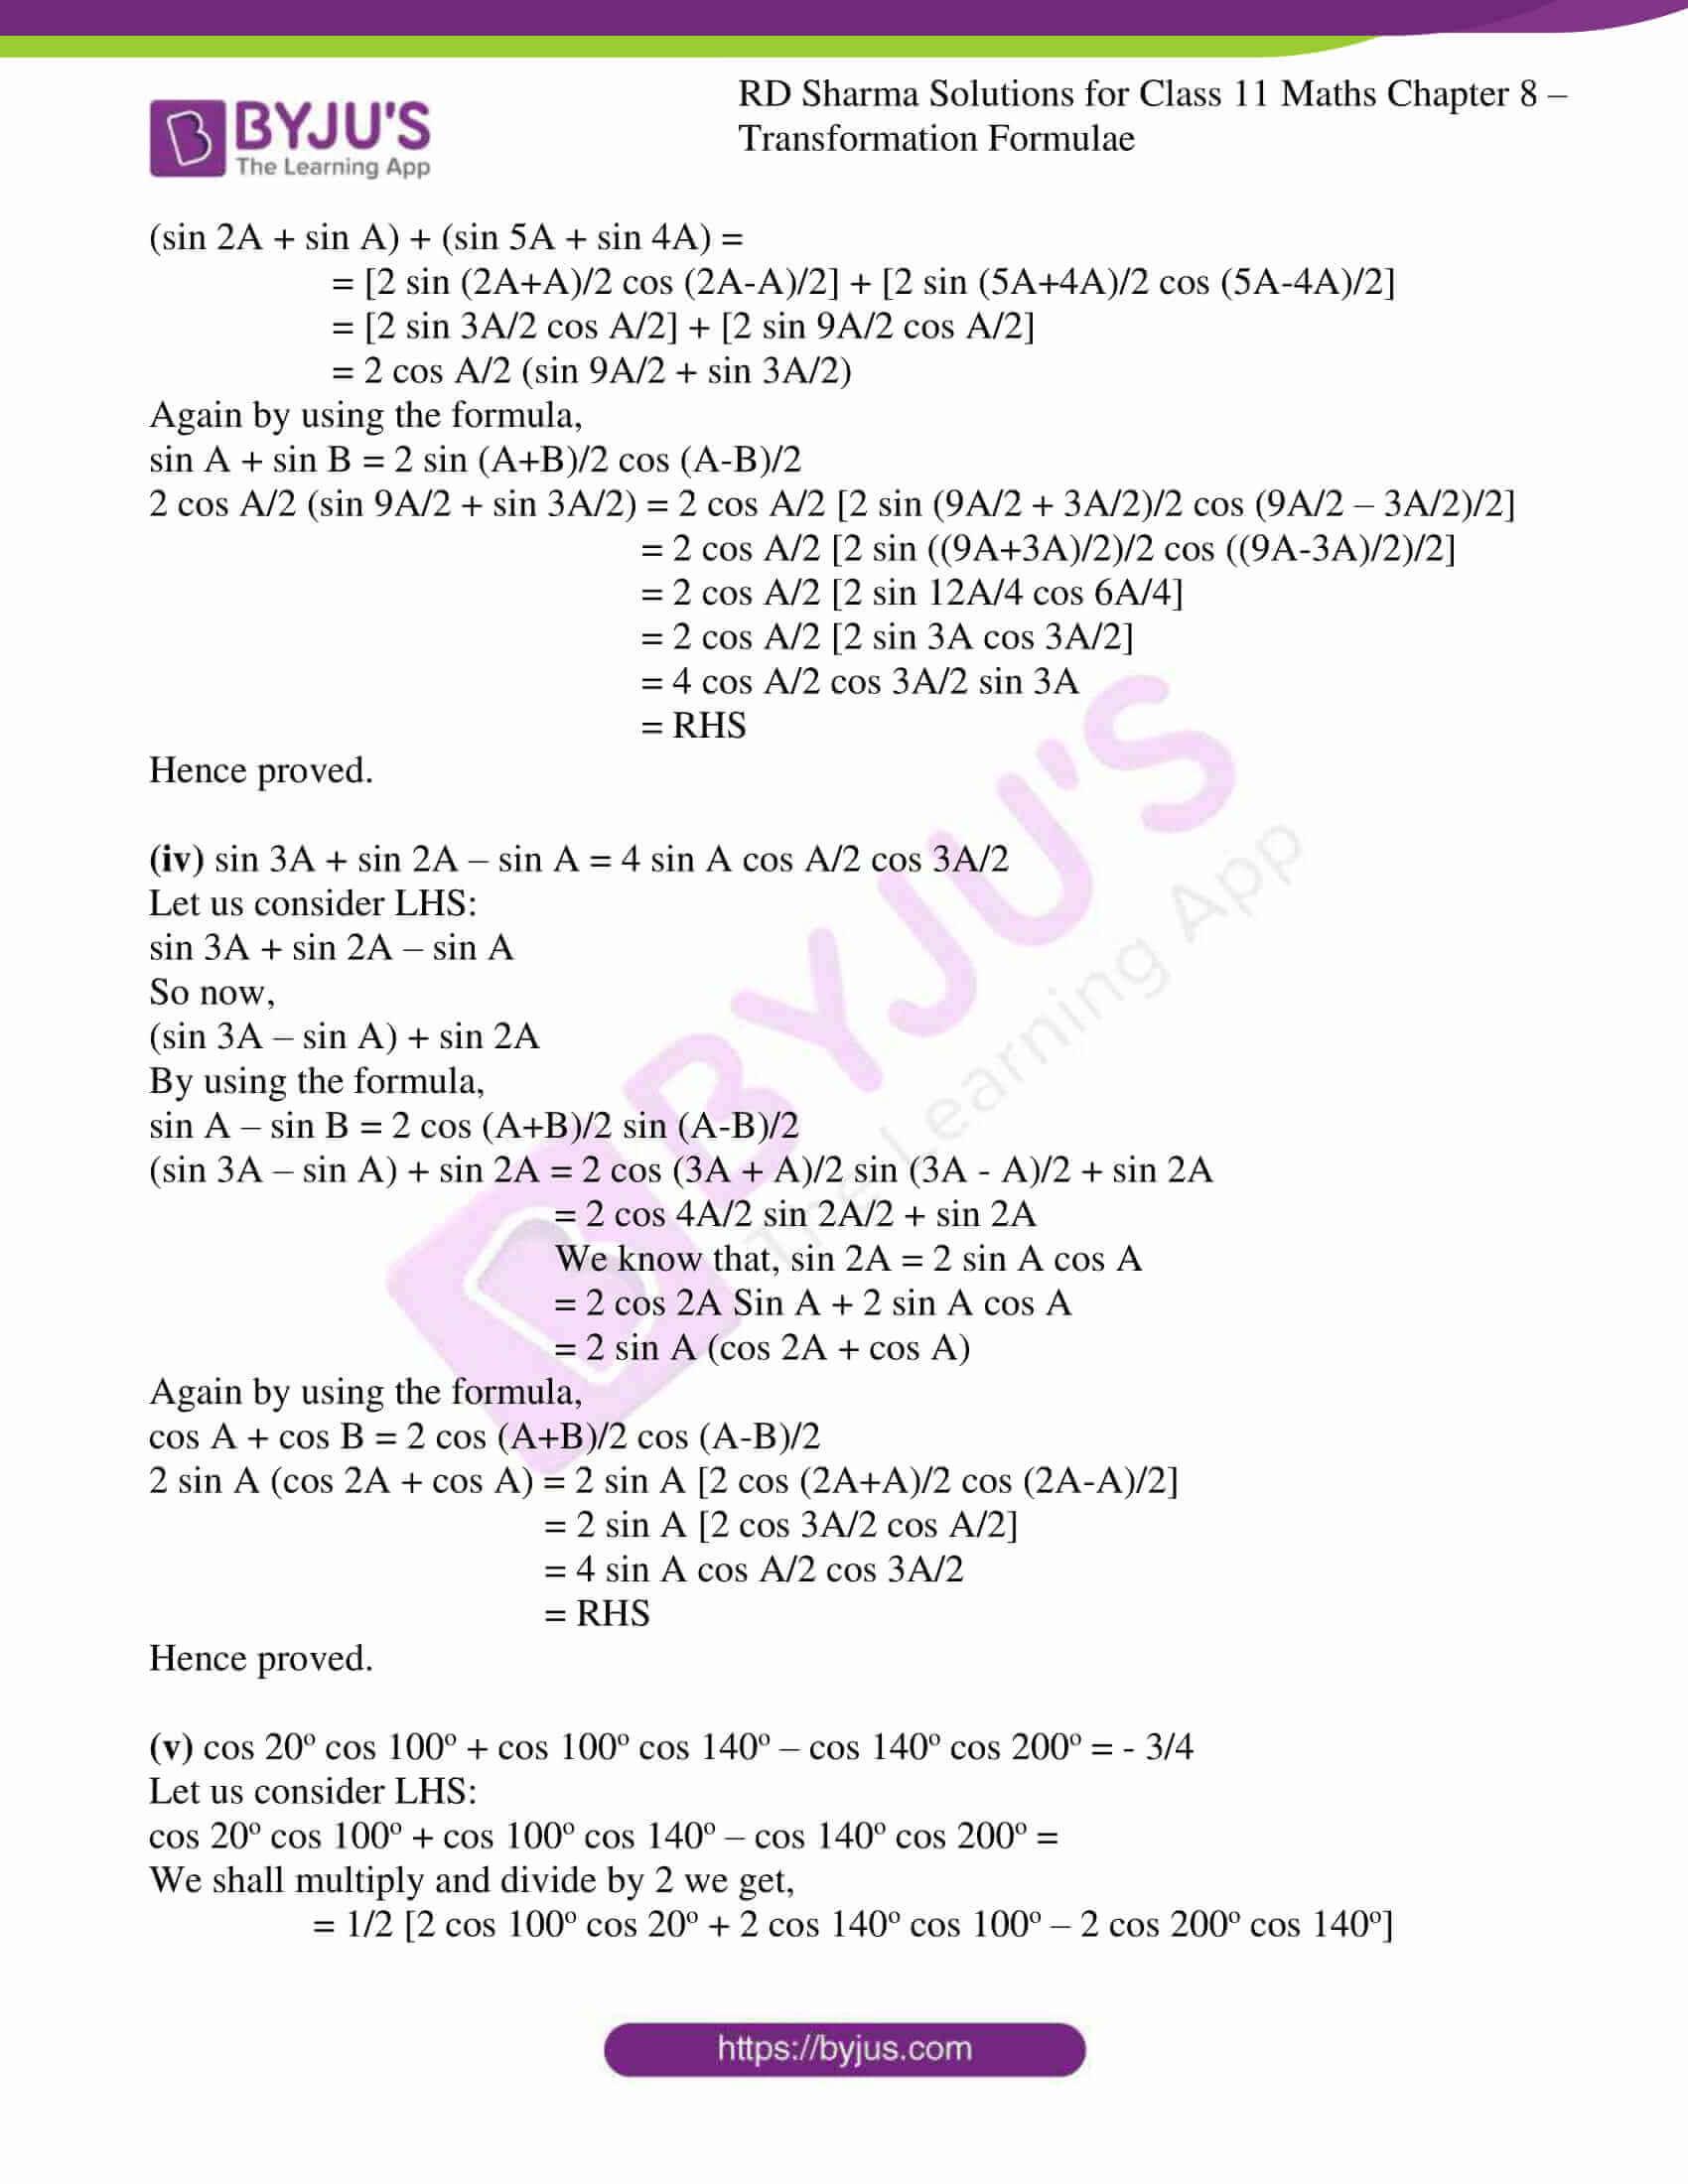 rd sharma class 11 maths ch 8 ex 2 11